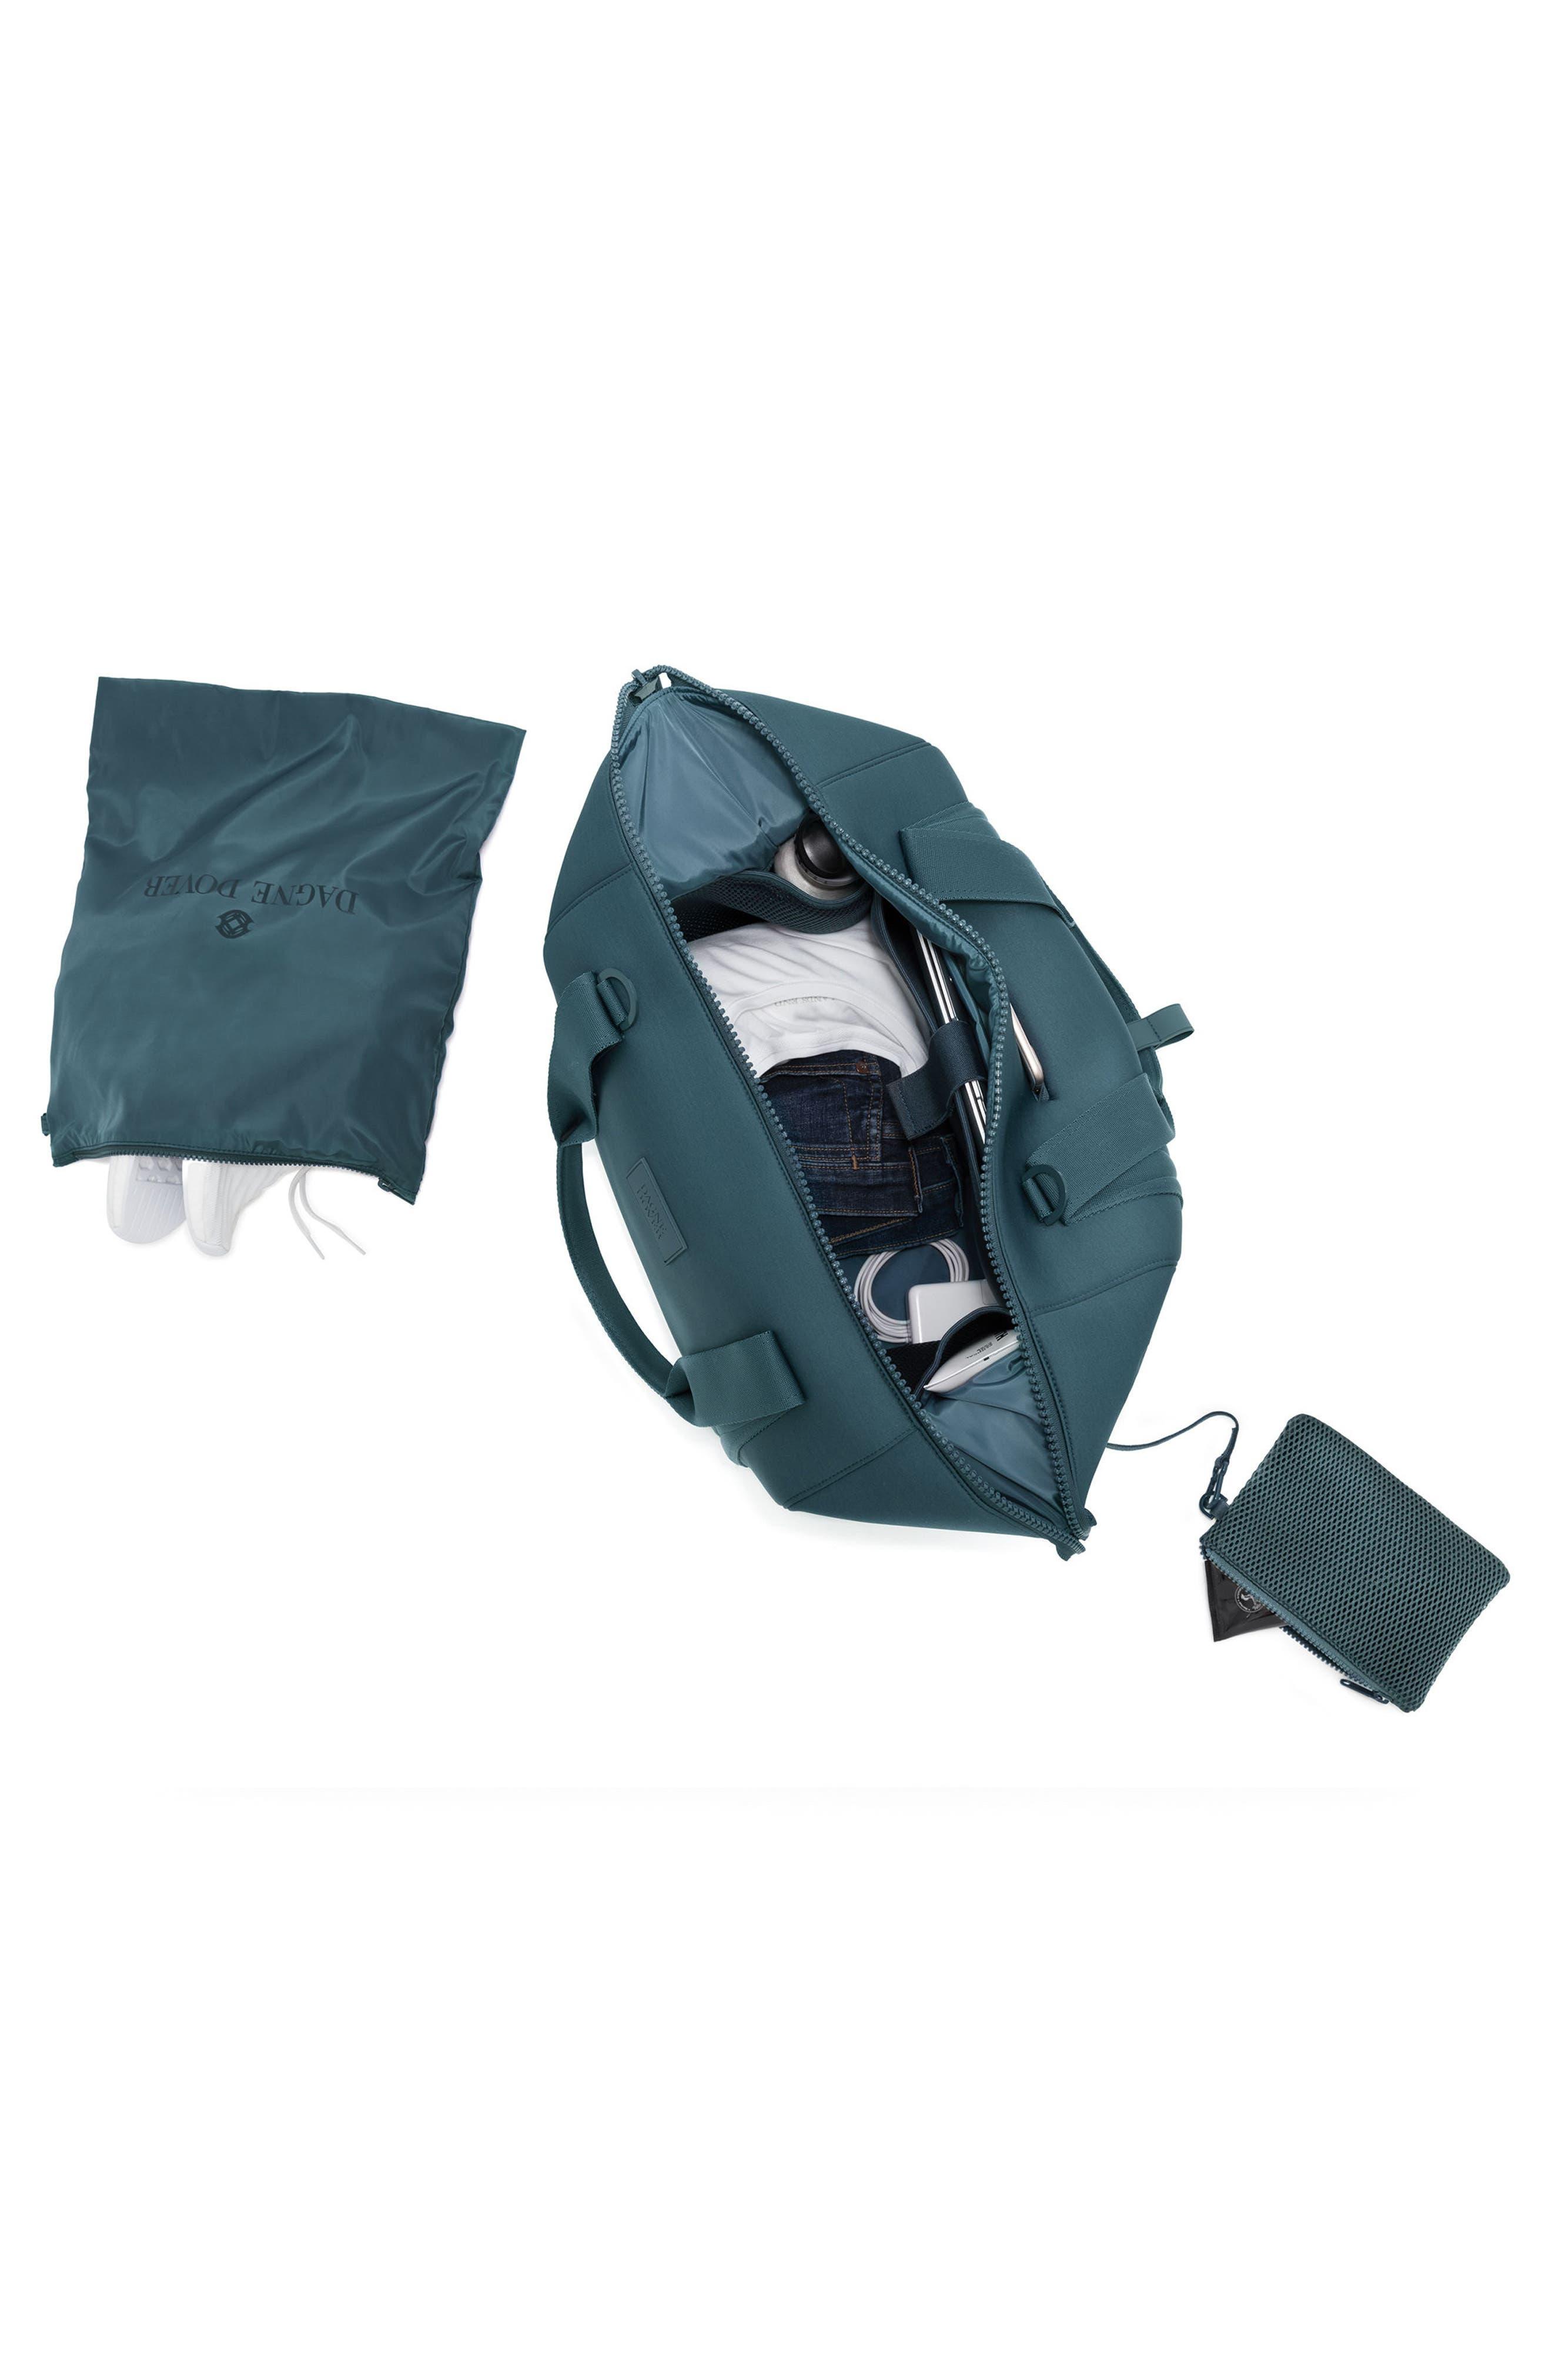 365 Large Landon Neoprene Carryall Duffel Bag,                             Alternate thumbnail 11, color,